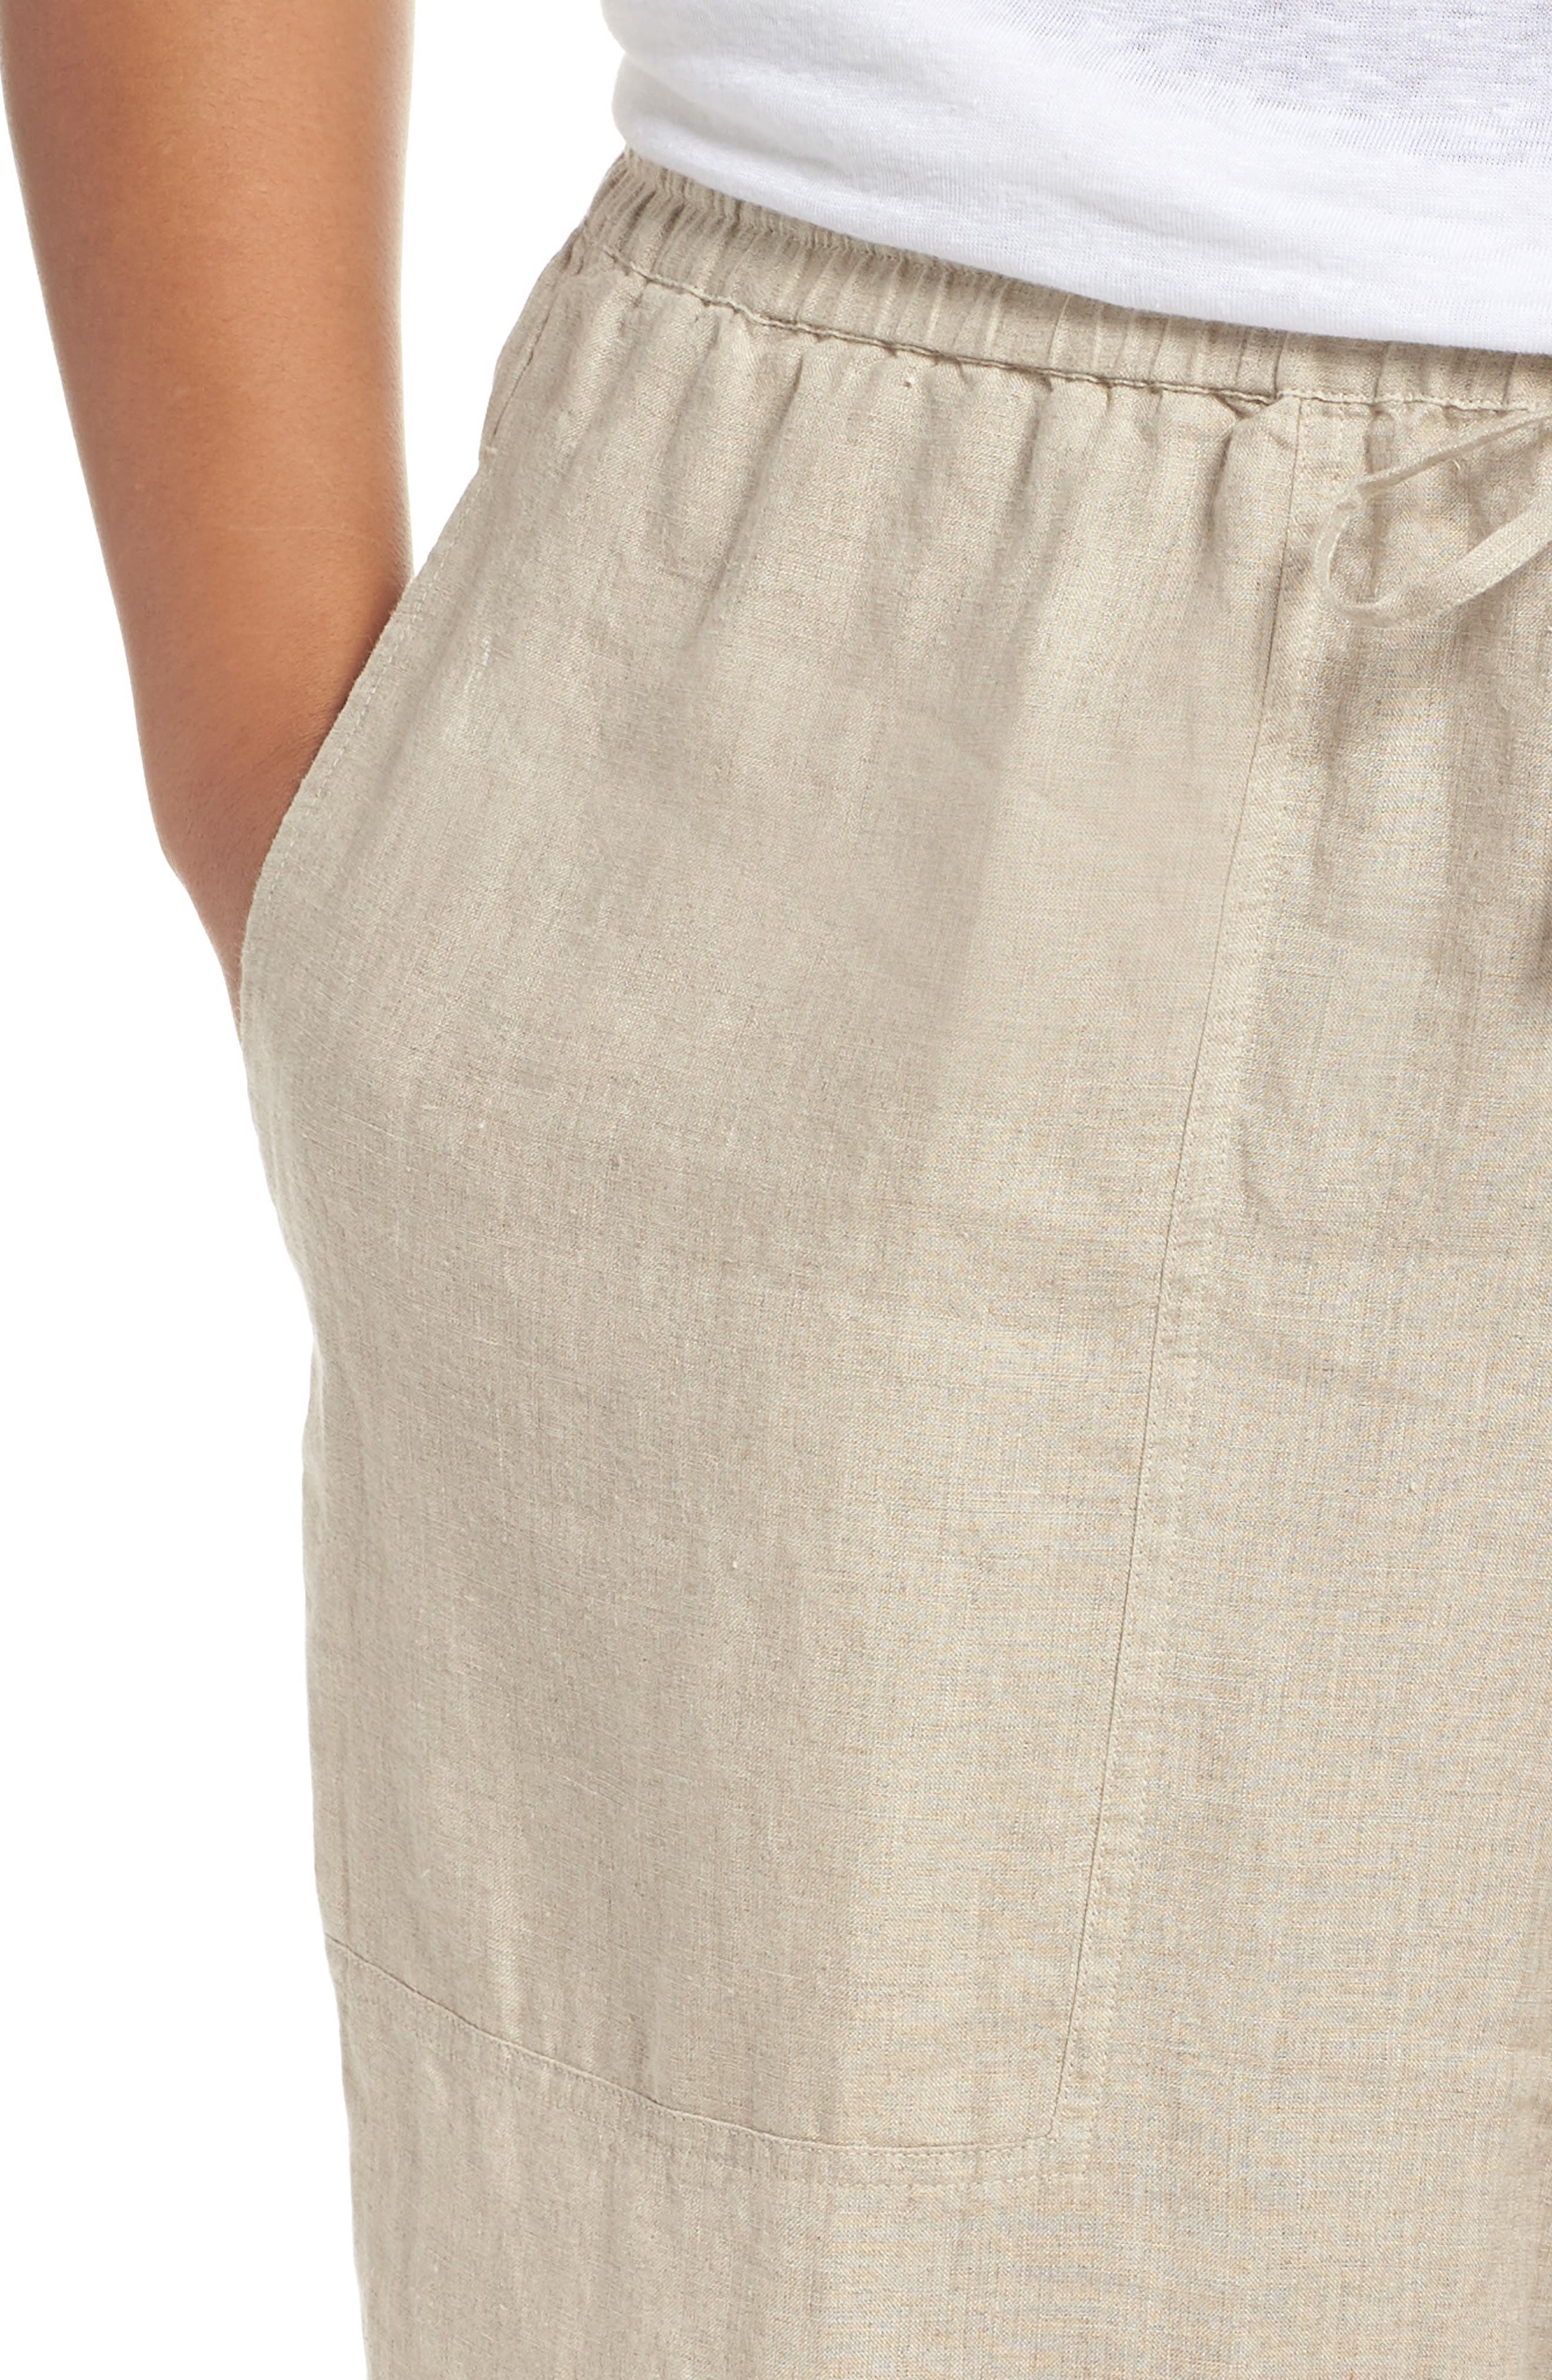 Organic Linen Ankle Pants,                             Alternate thumbnail 4, color,                             Undyed Natural